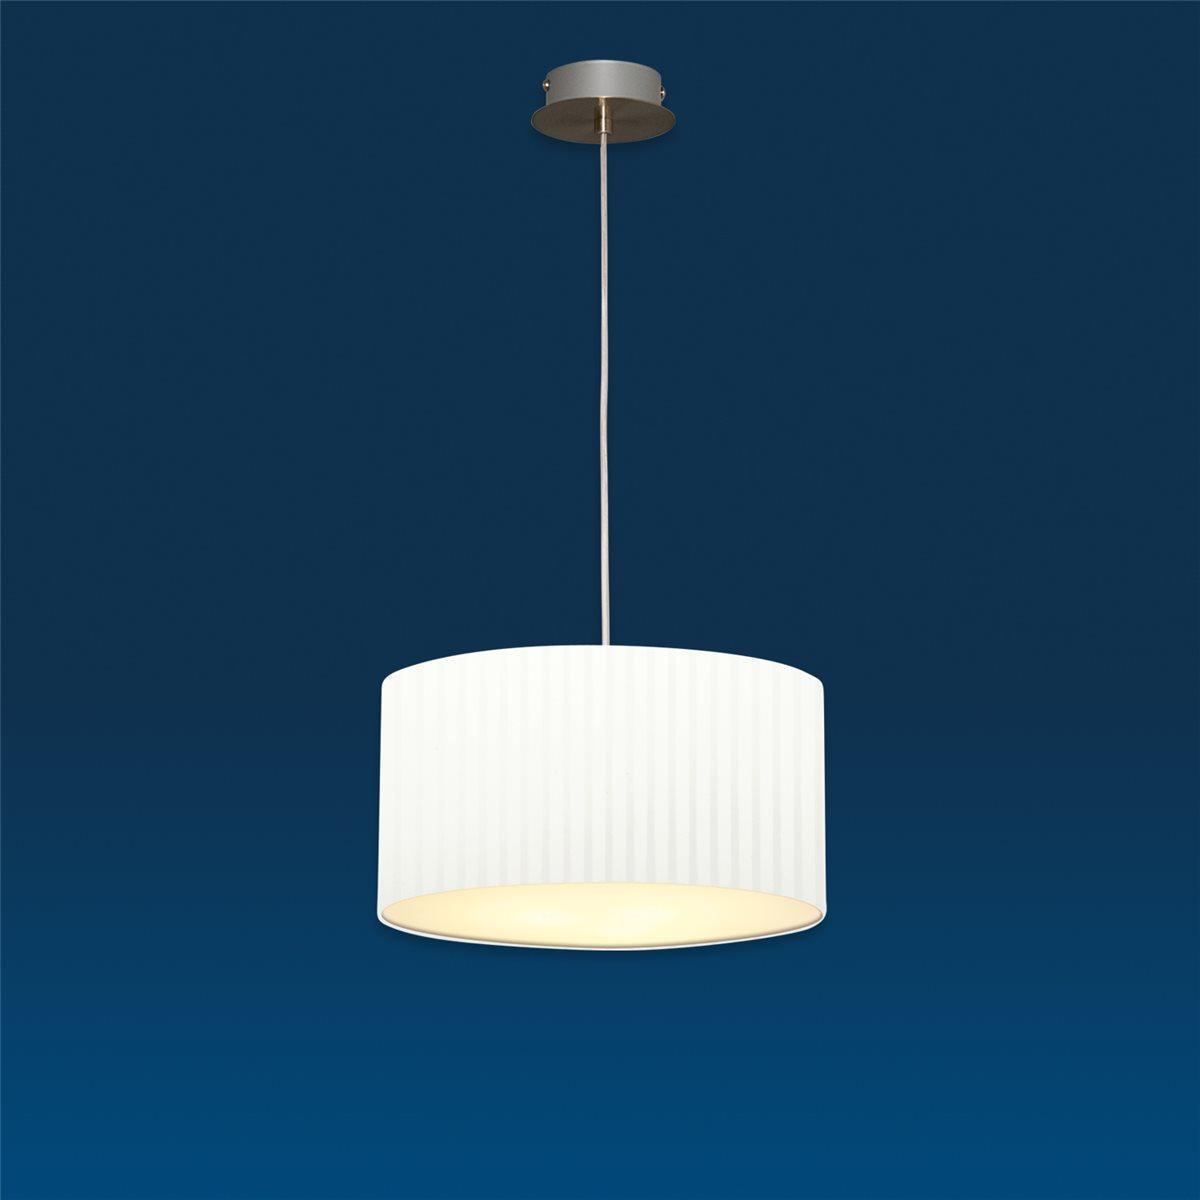 Lampe esszimmer